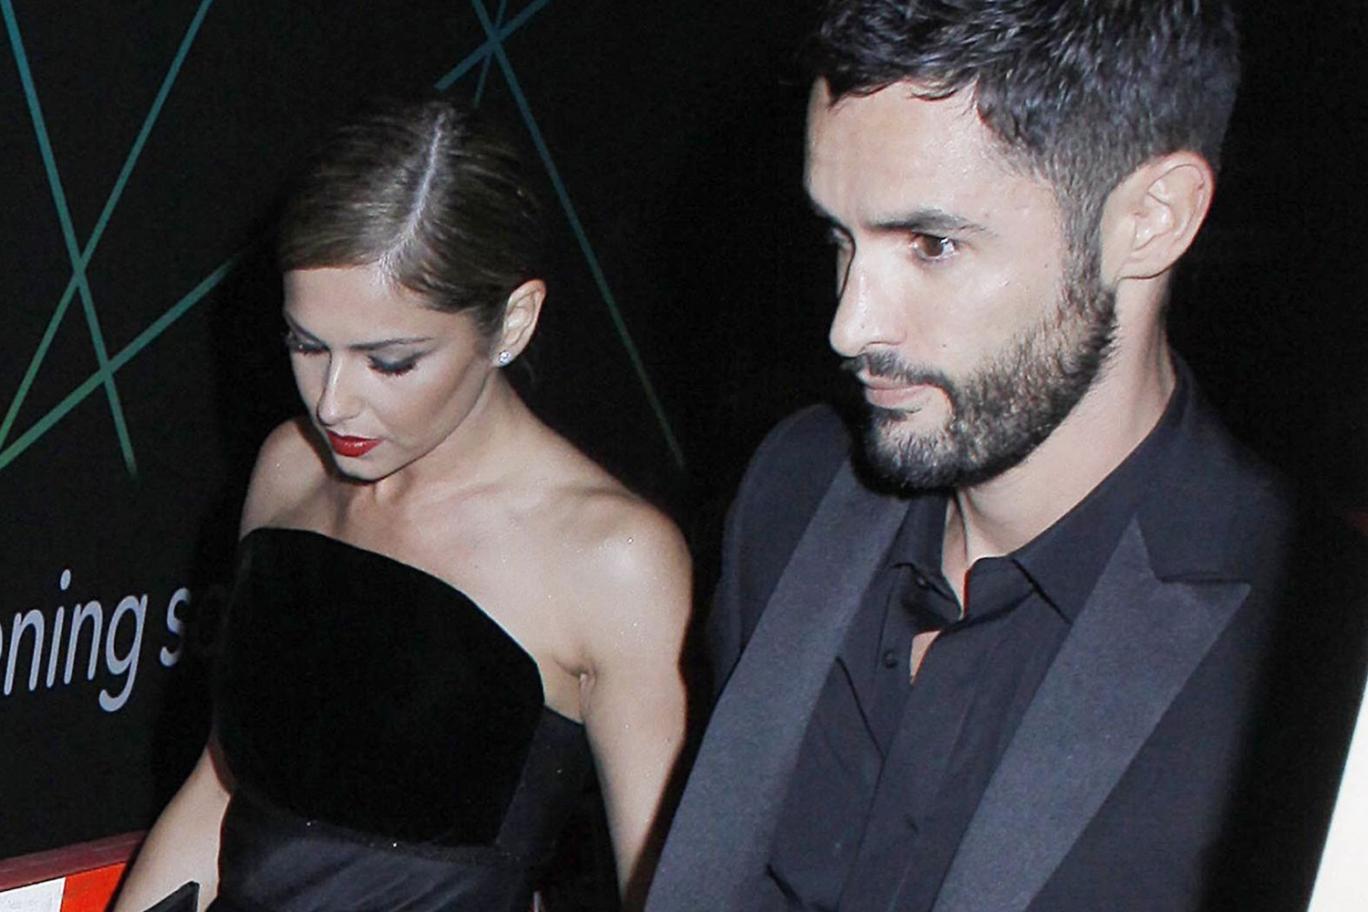 Cheryl and JB